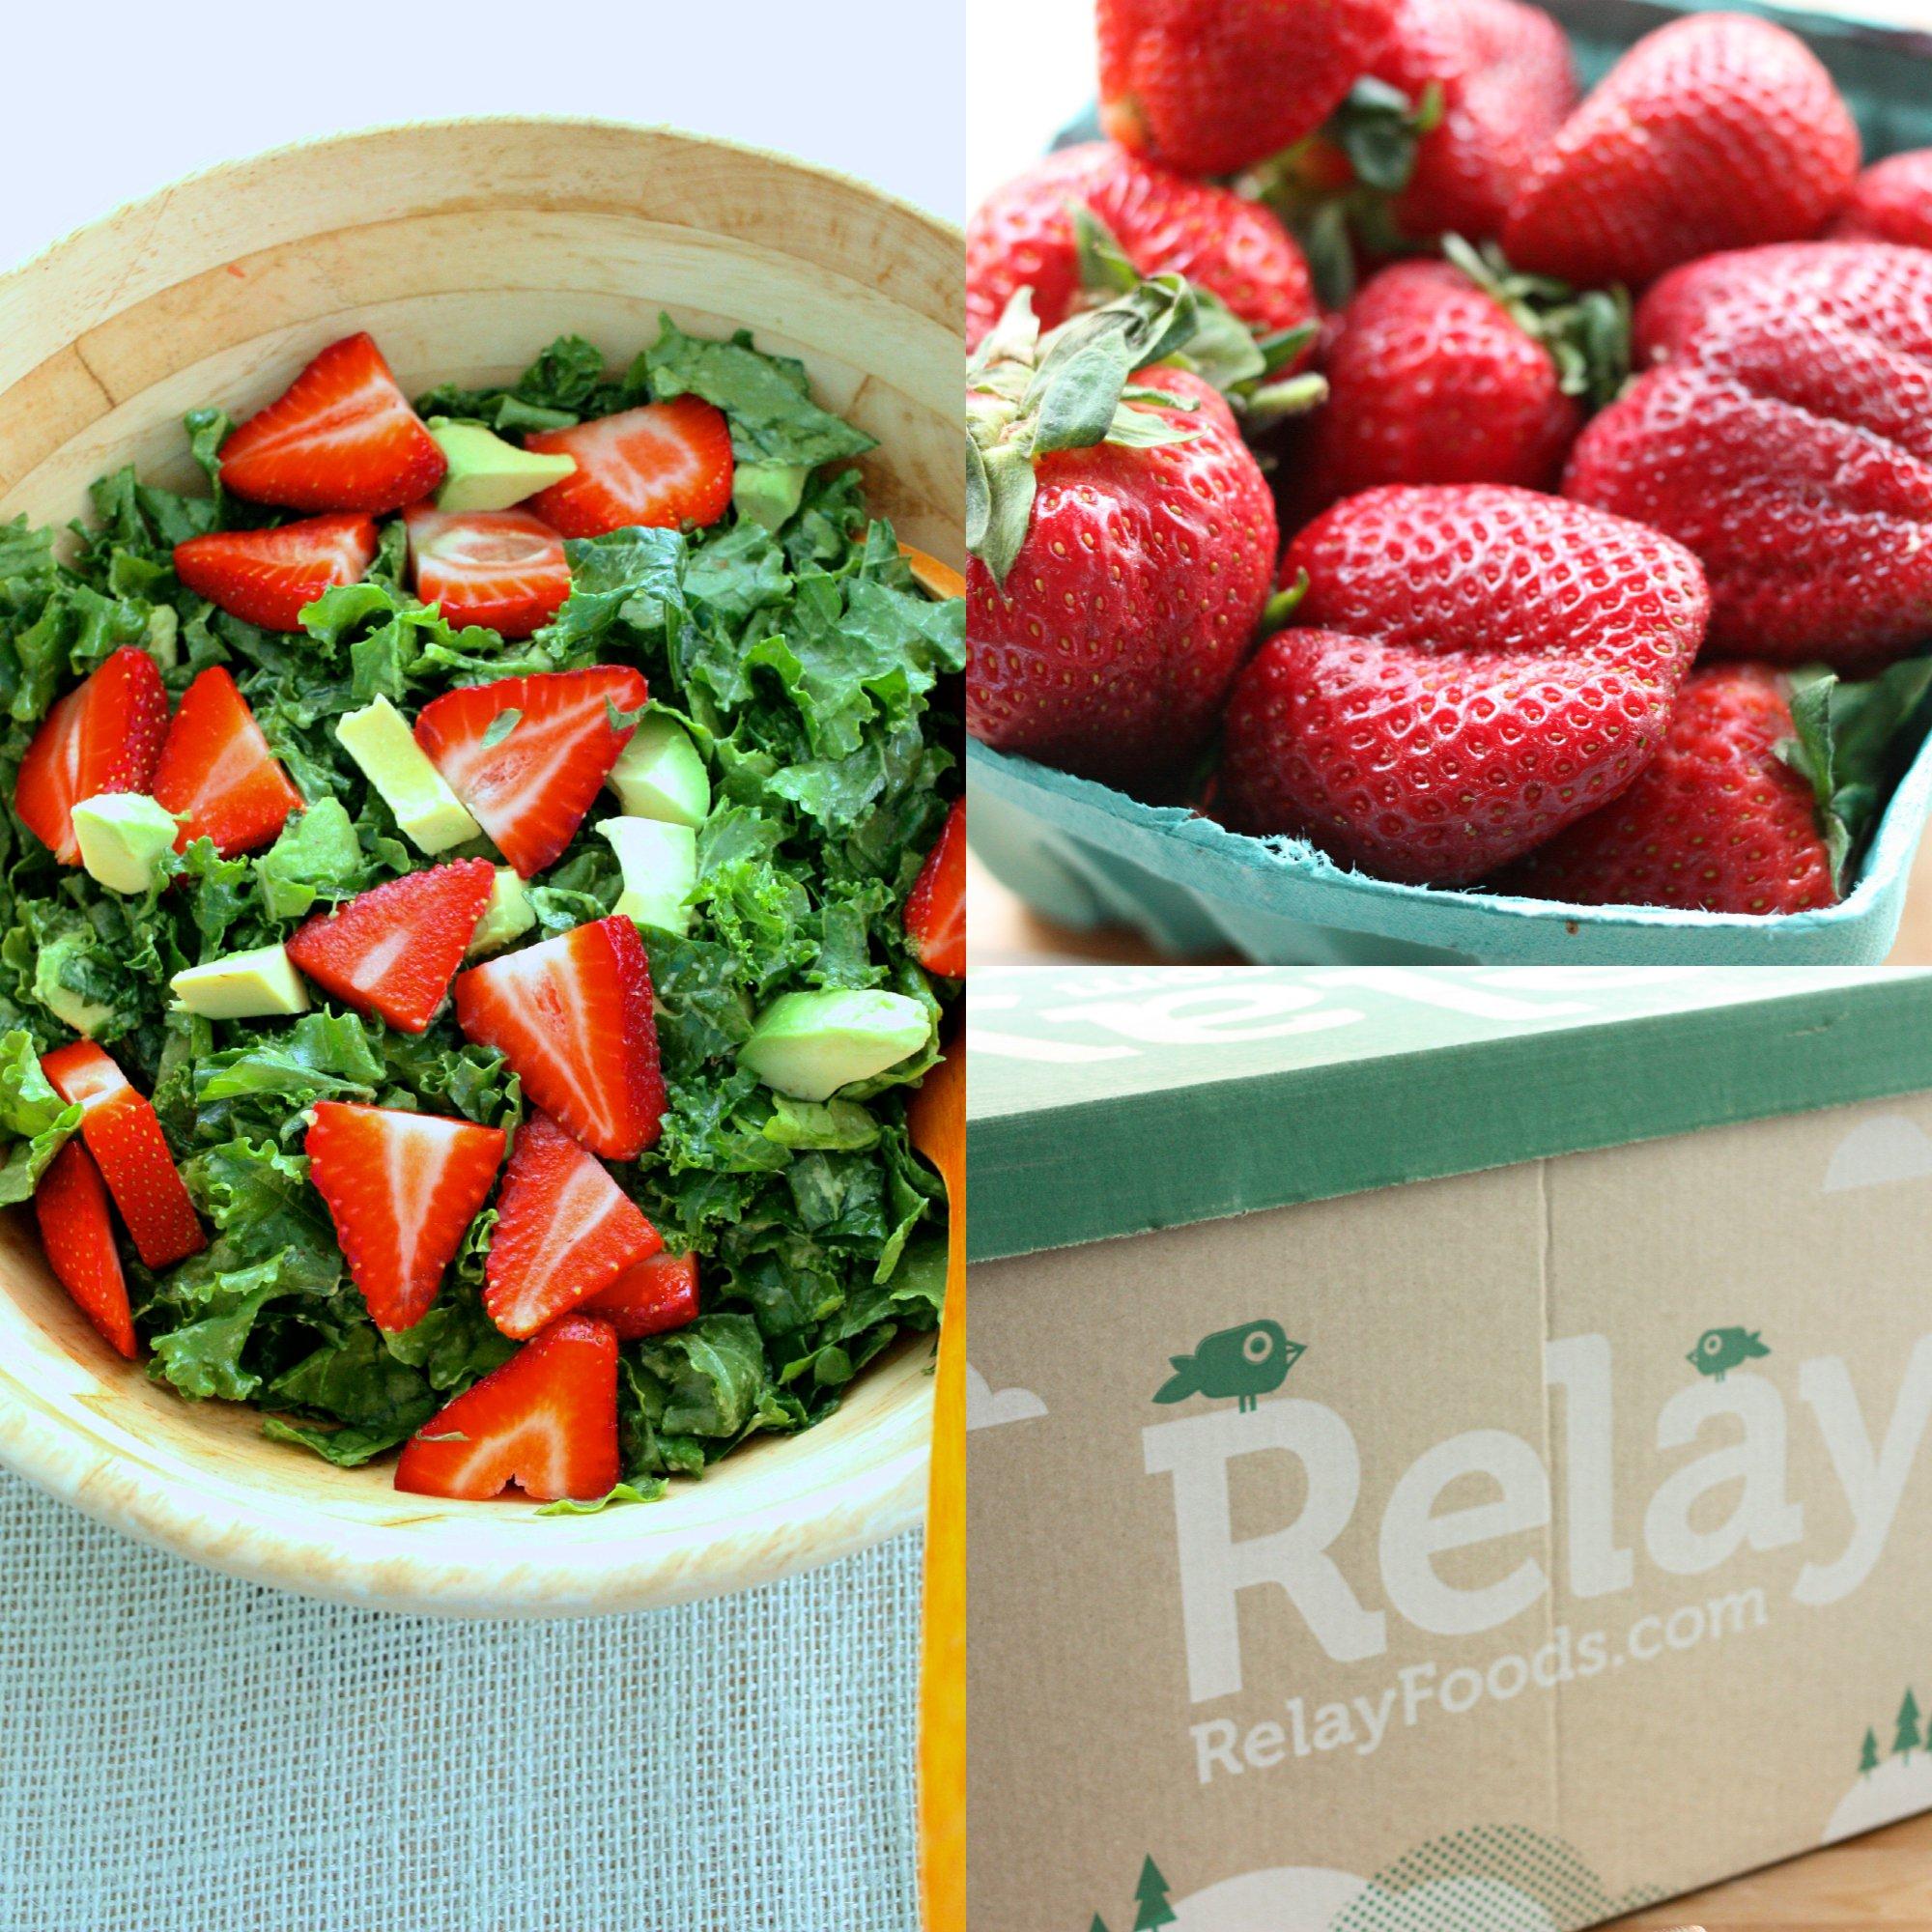 Relay Foods 1